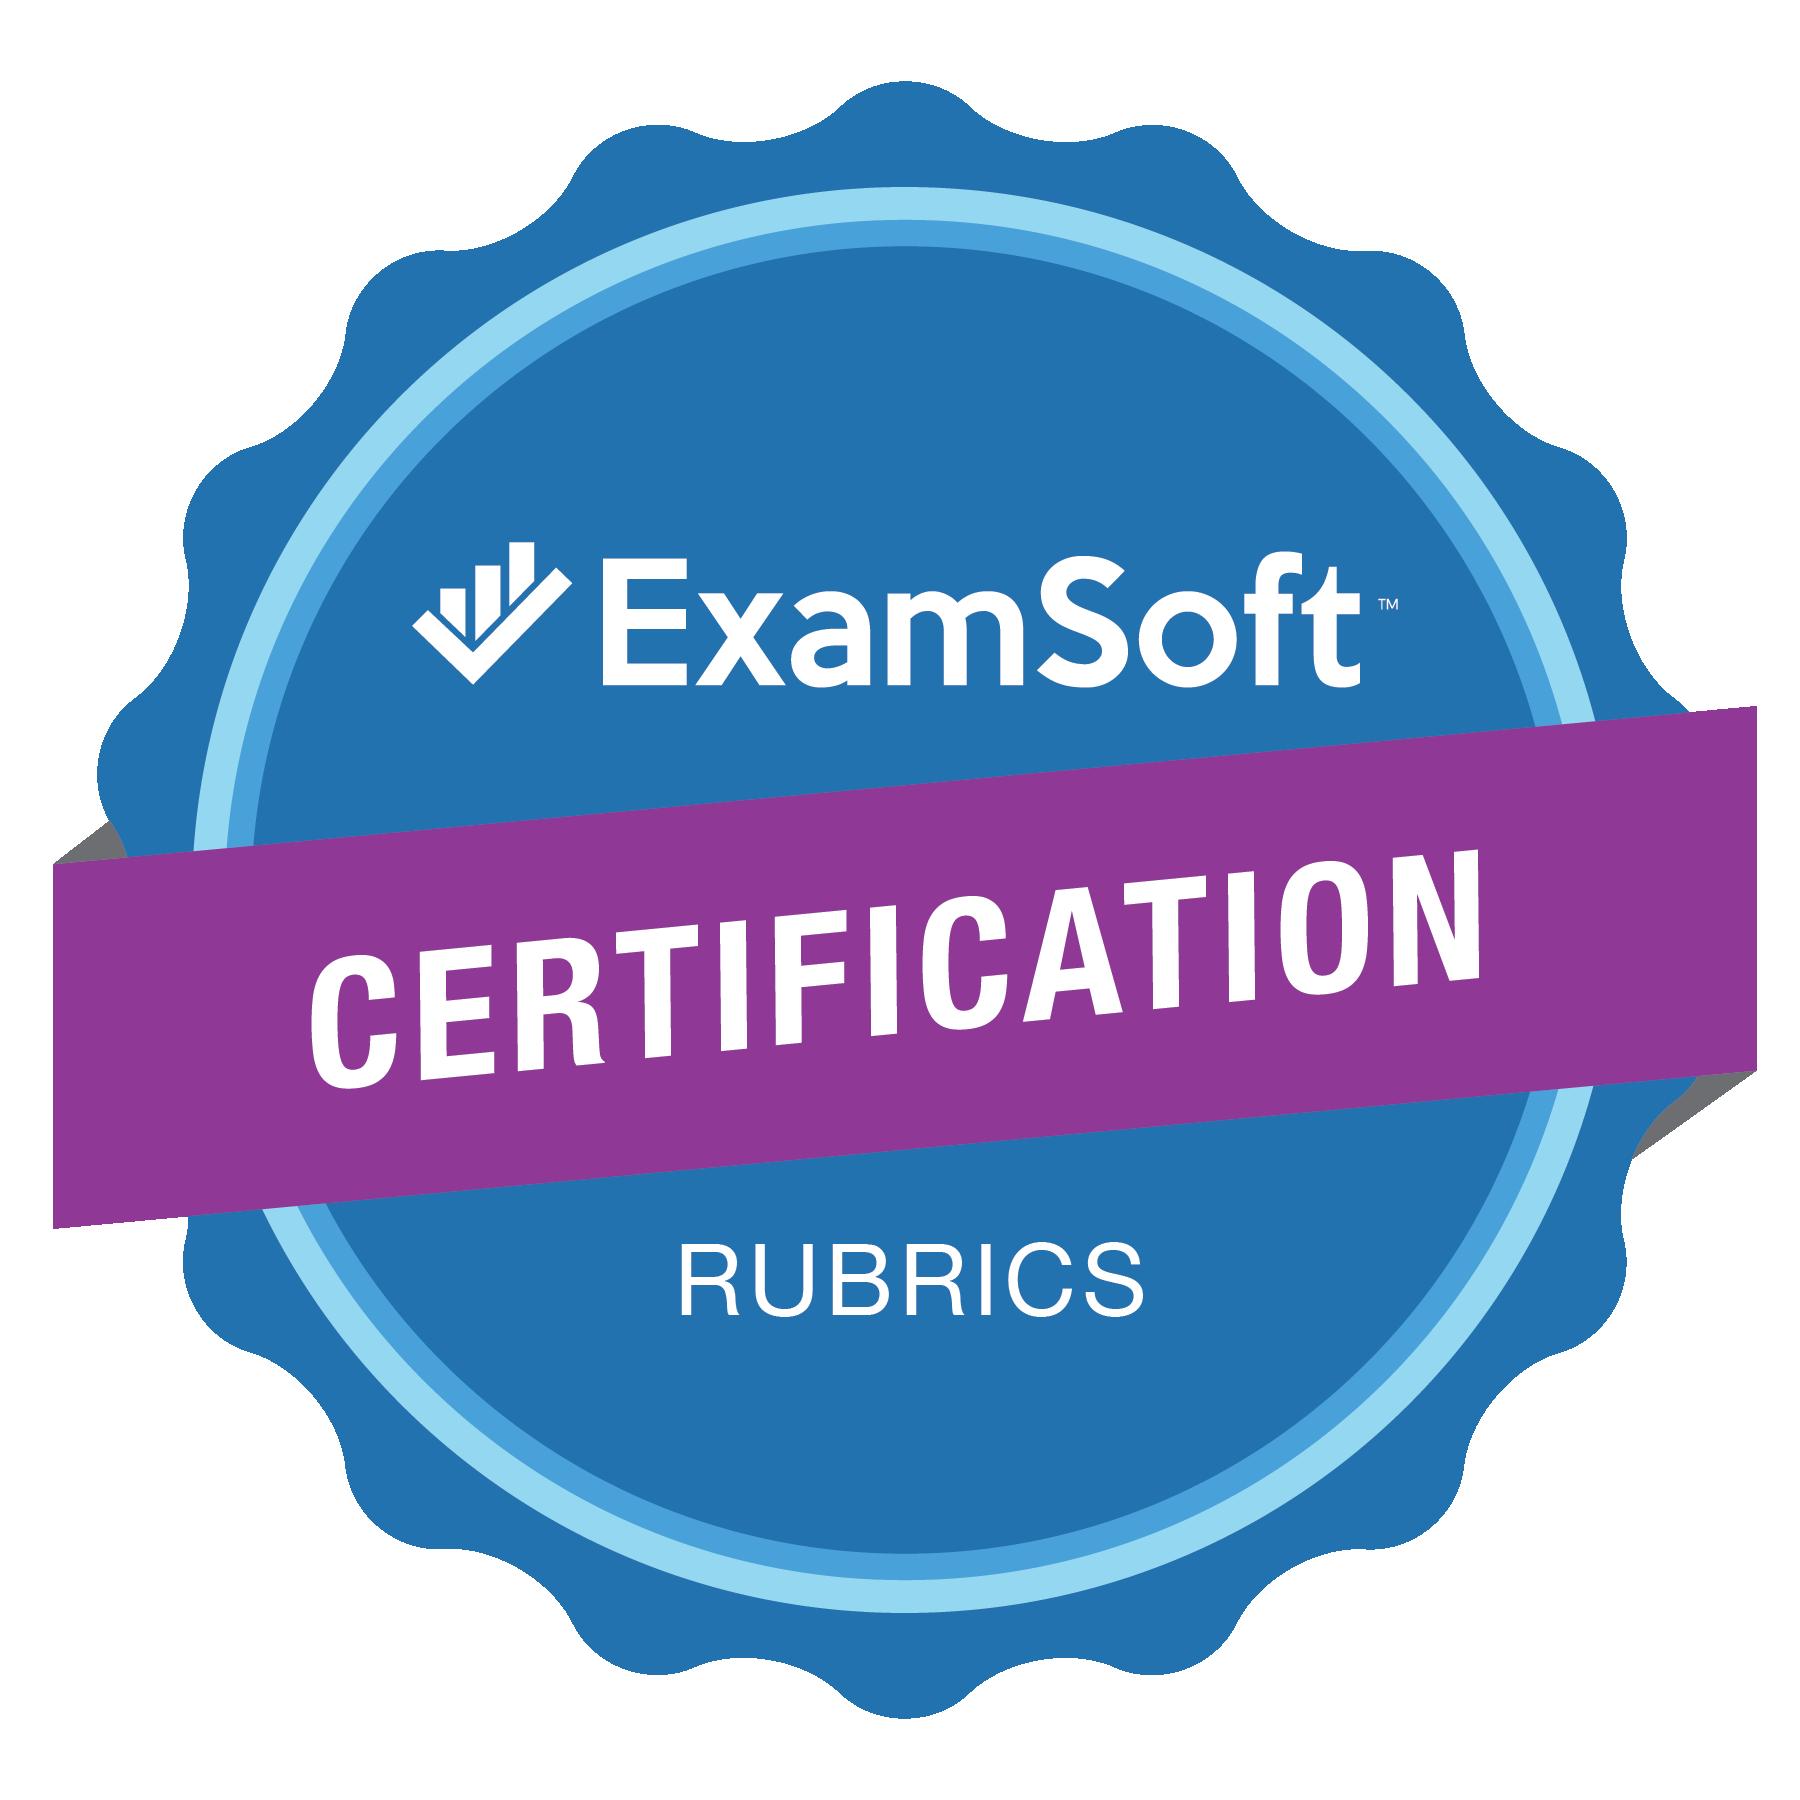 The ExamSoft Certification Rubrics Program Badge